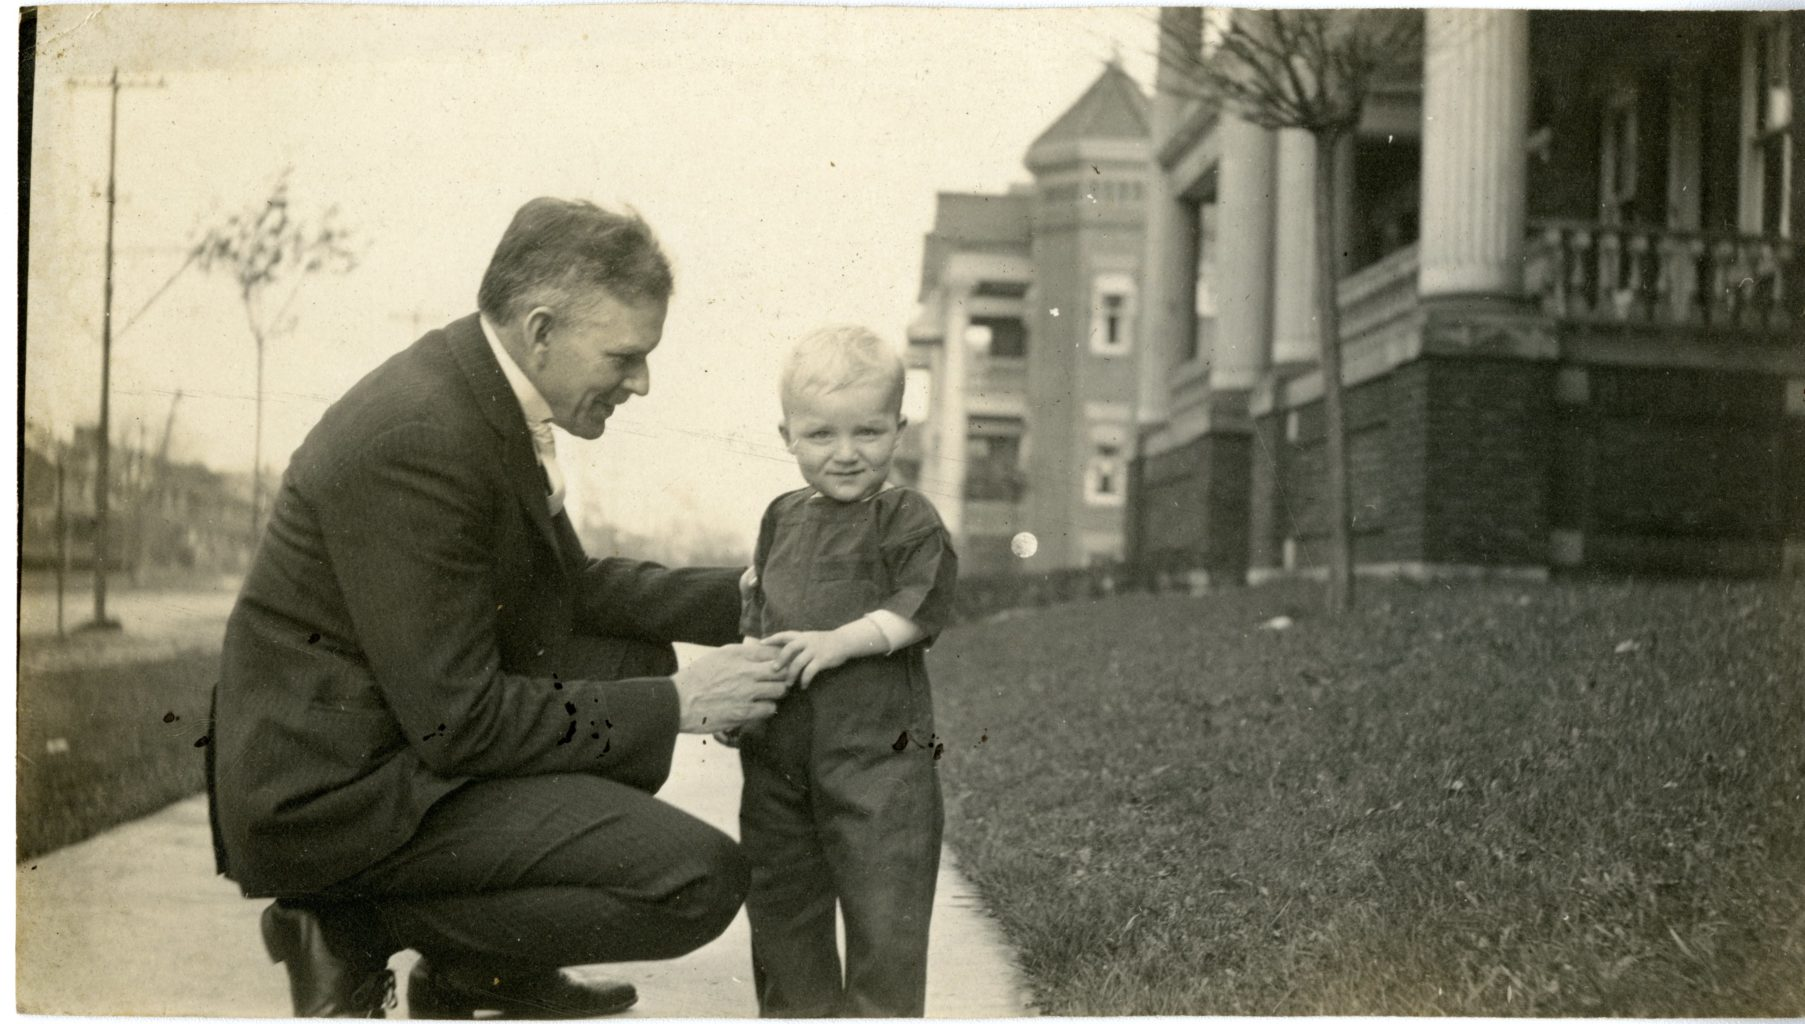 John Koren and male adult pose on a sidewalk.